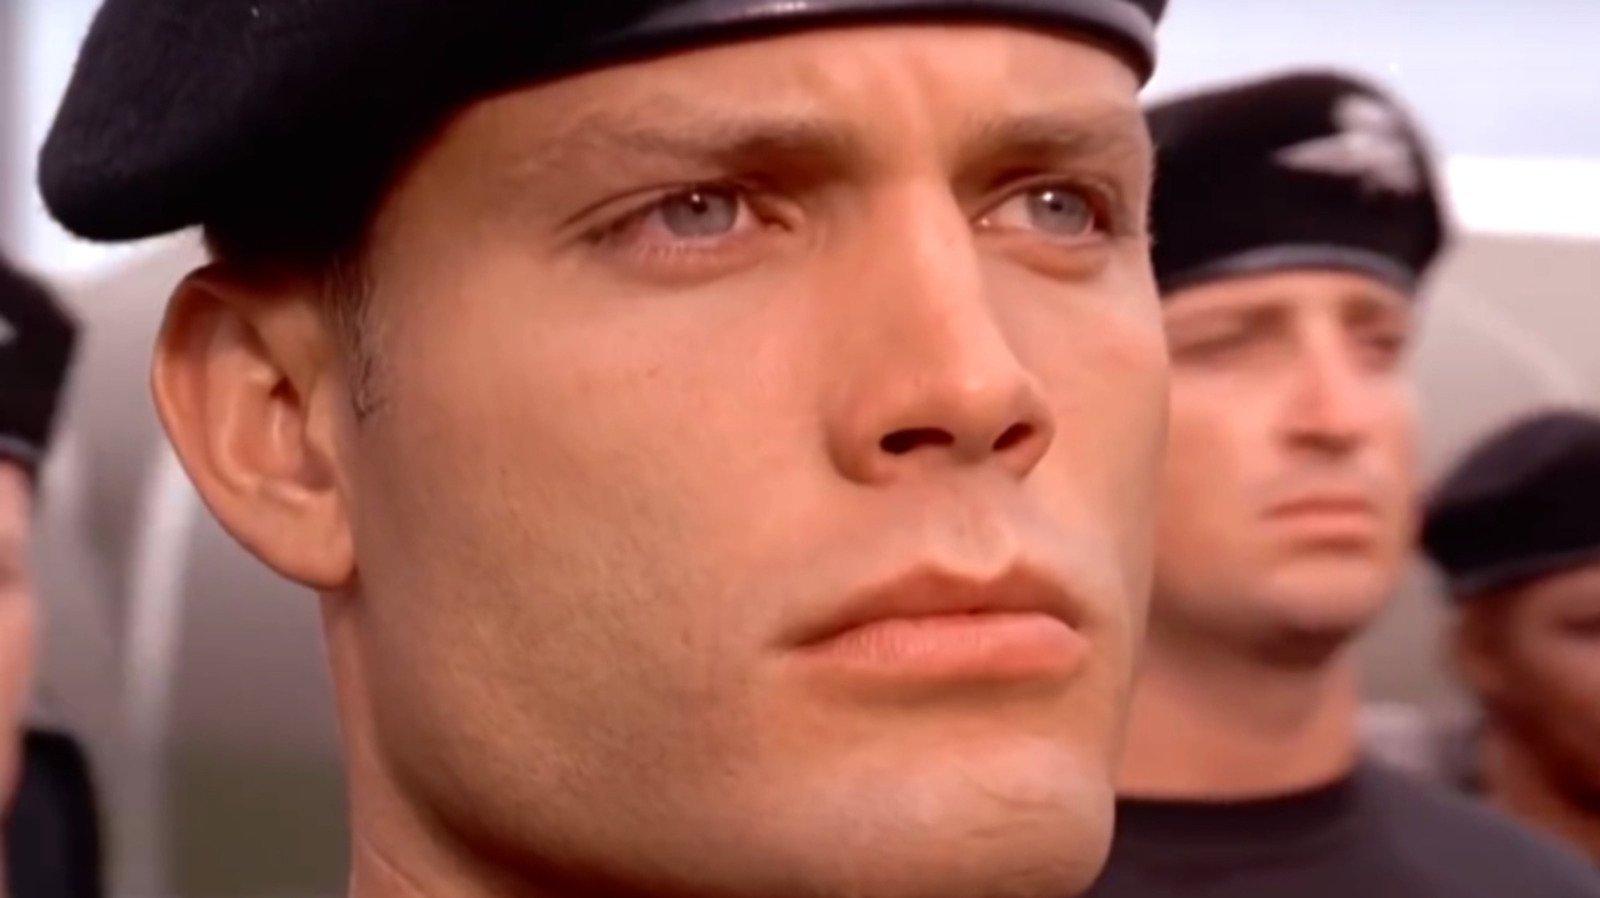 The Terrifying Injury Casper Van Dien That Sustained Making Starship Troopers